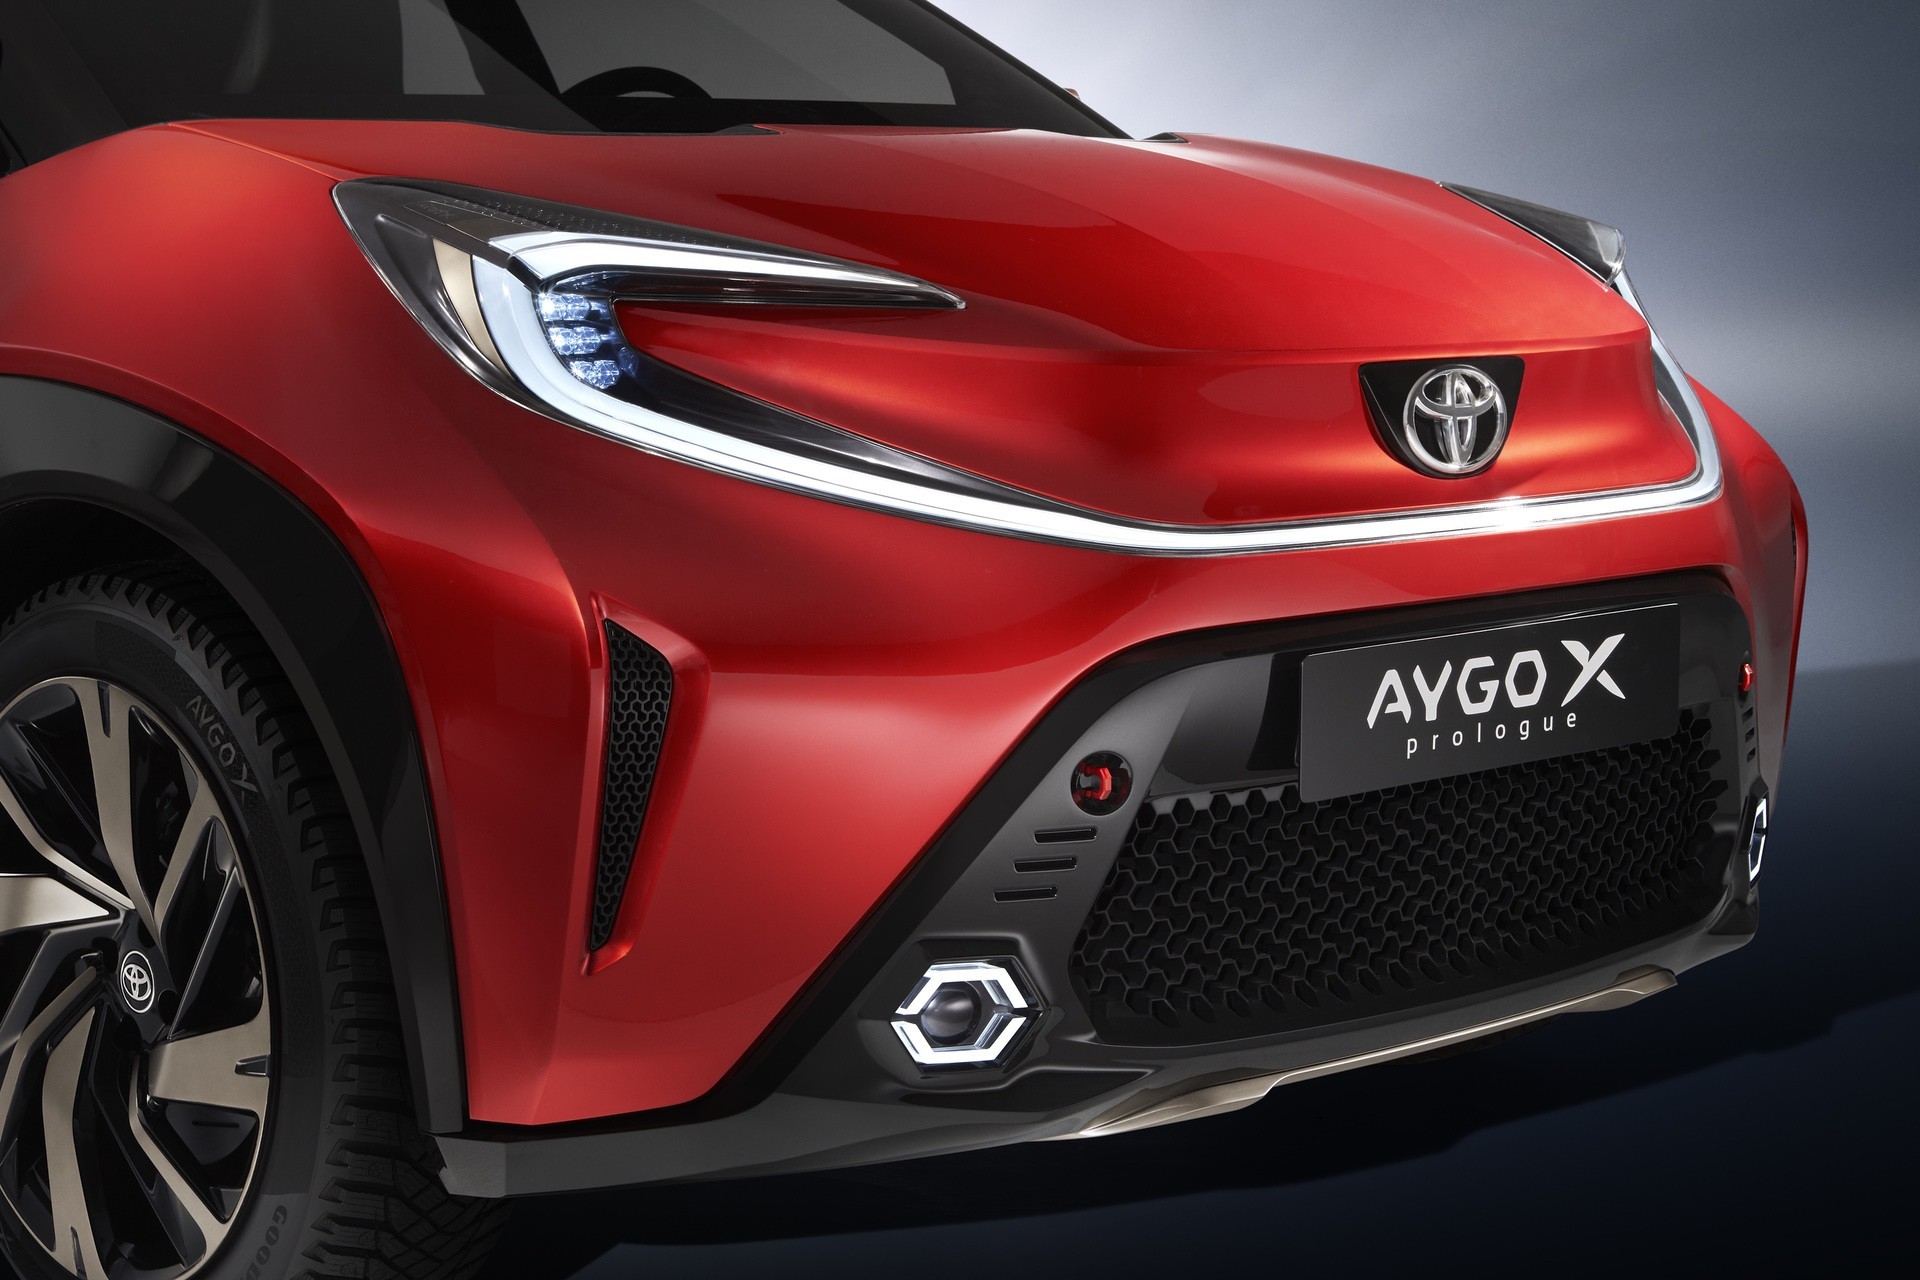 Toyota_Aygo_X_prologue-0032